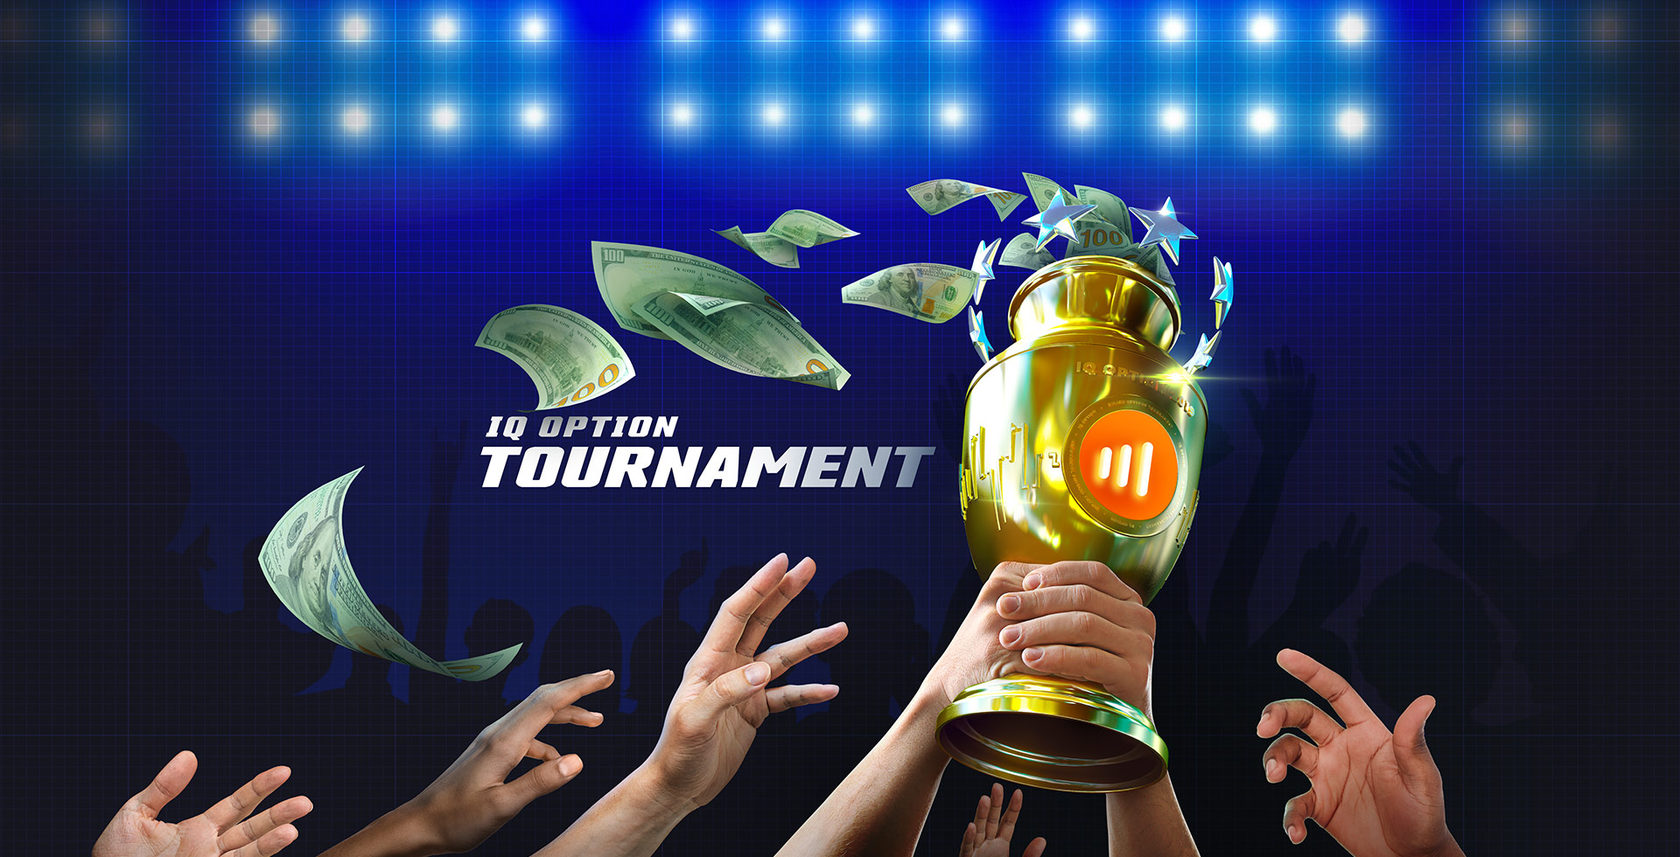 IQ Option ट्रेडिंग टूर्नामेंट - $ 50,000 तक पुरस्कार पूल